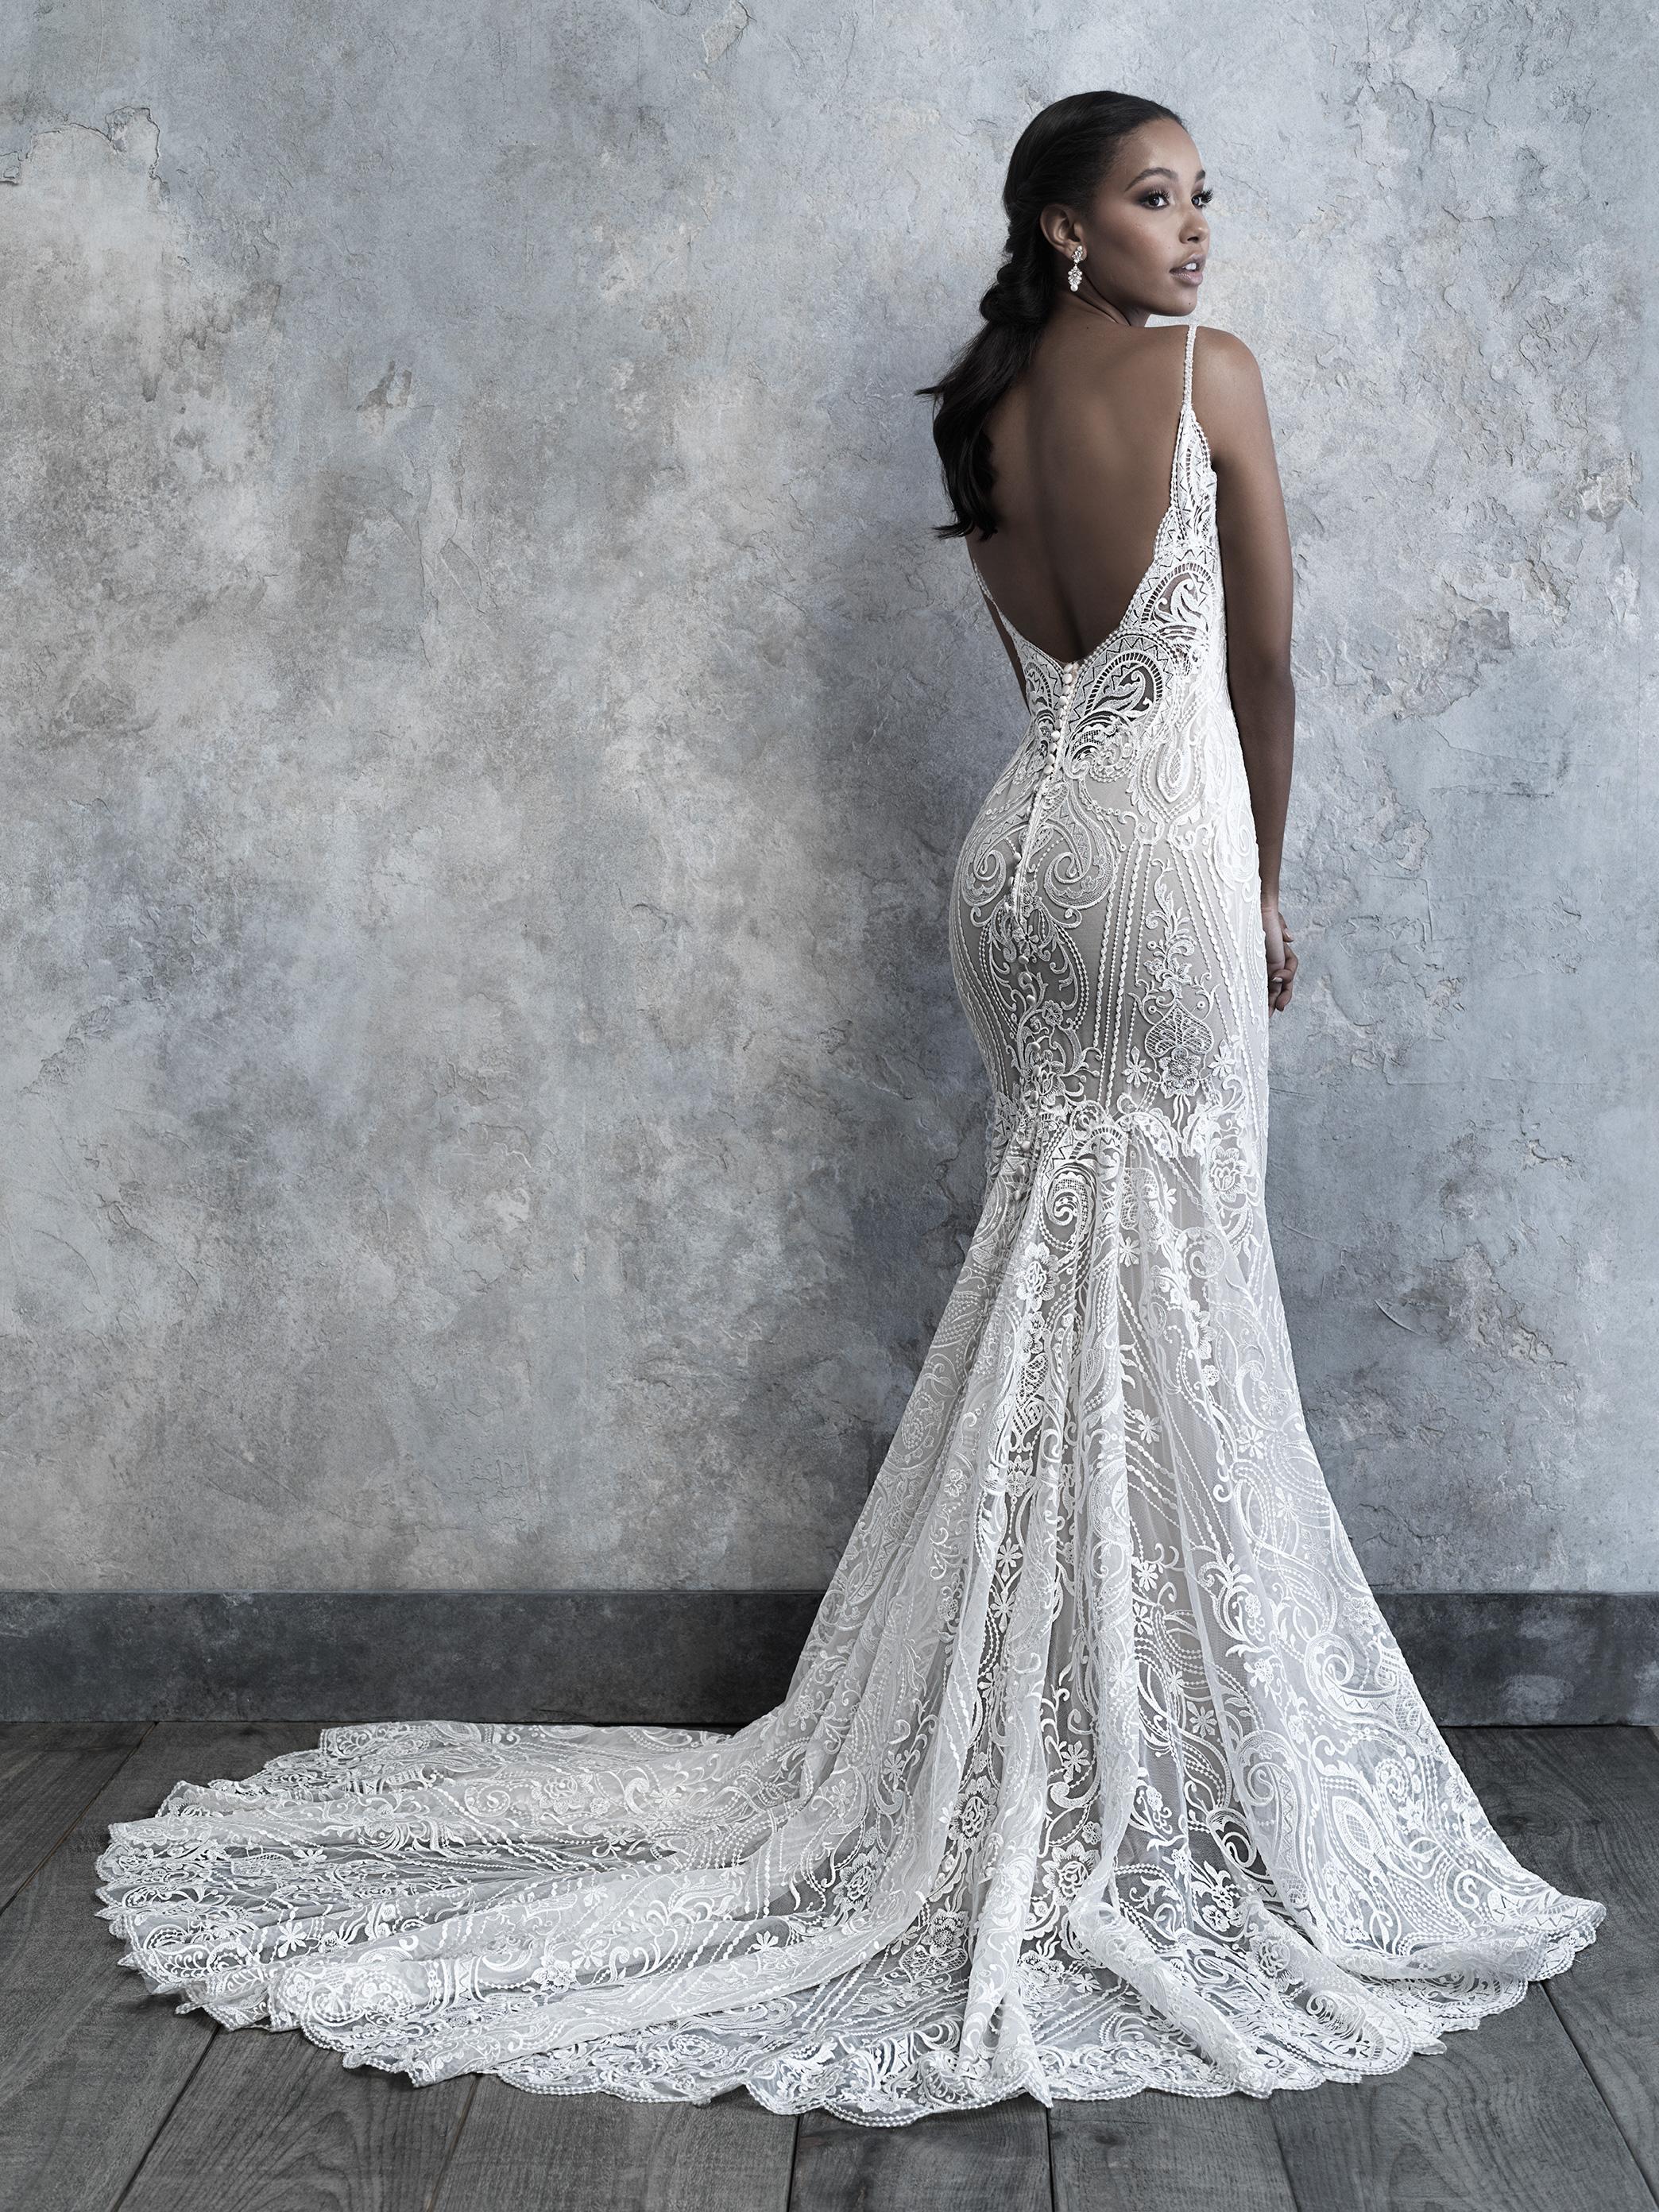 Spaghetti Strap V Neck Scrolled Lace Sheath Wedding Dress